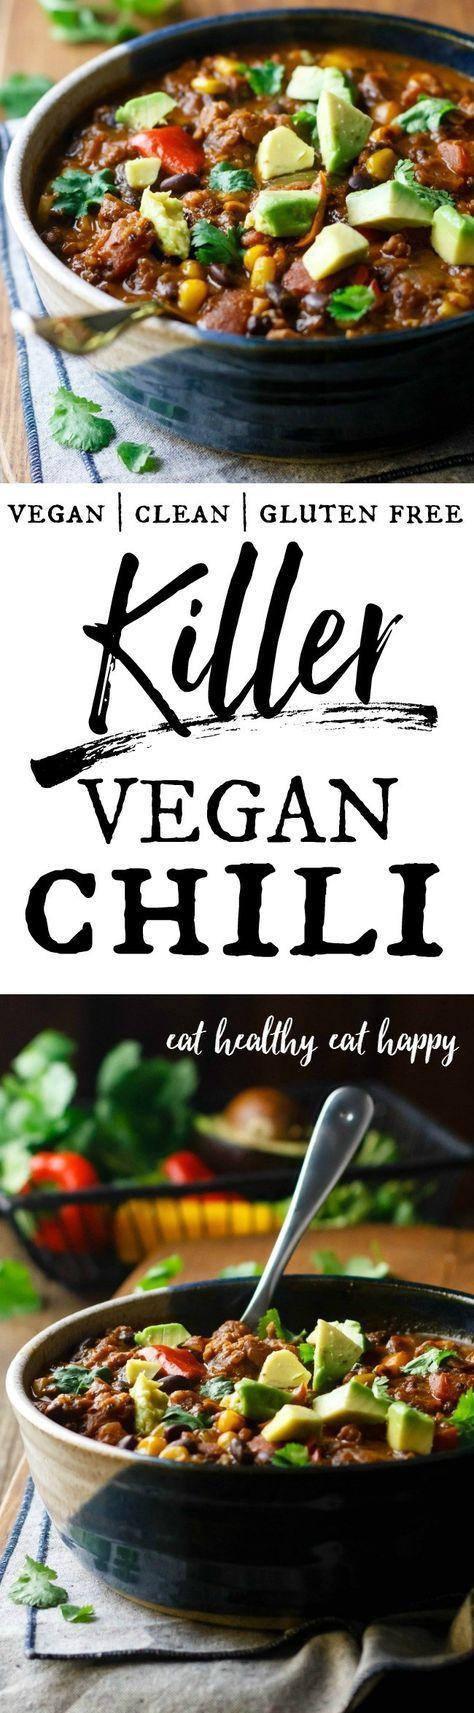 Mariage - Killer Vegan Chili